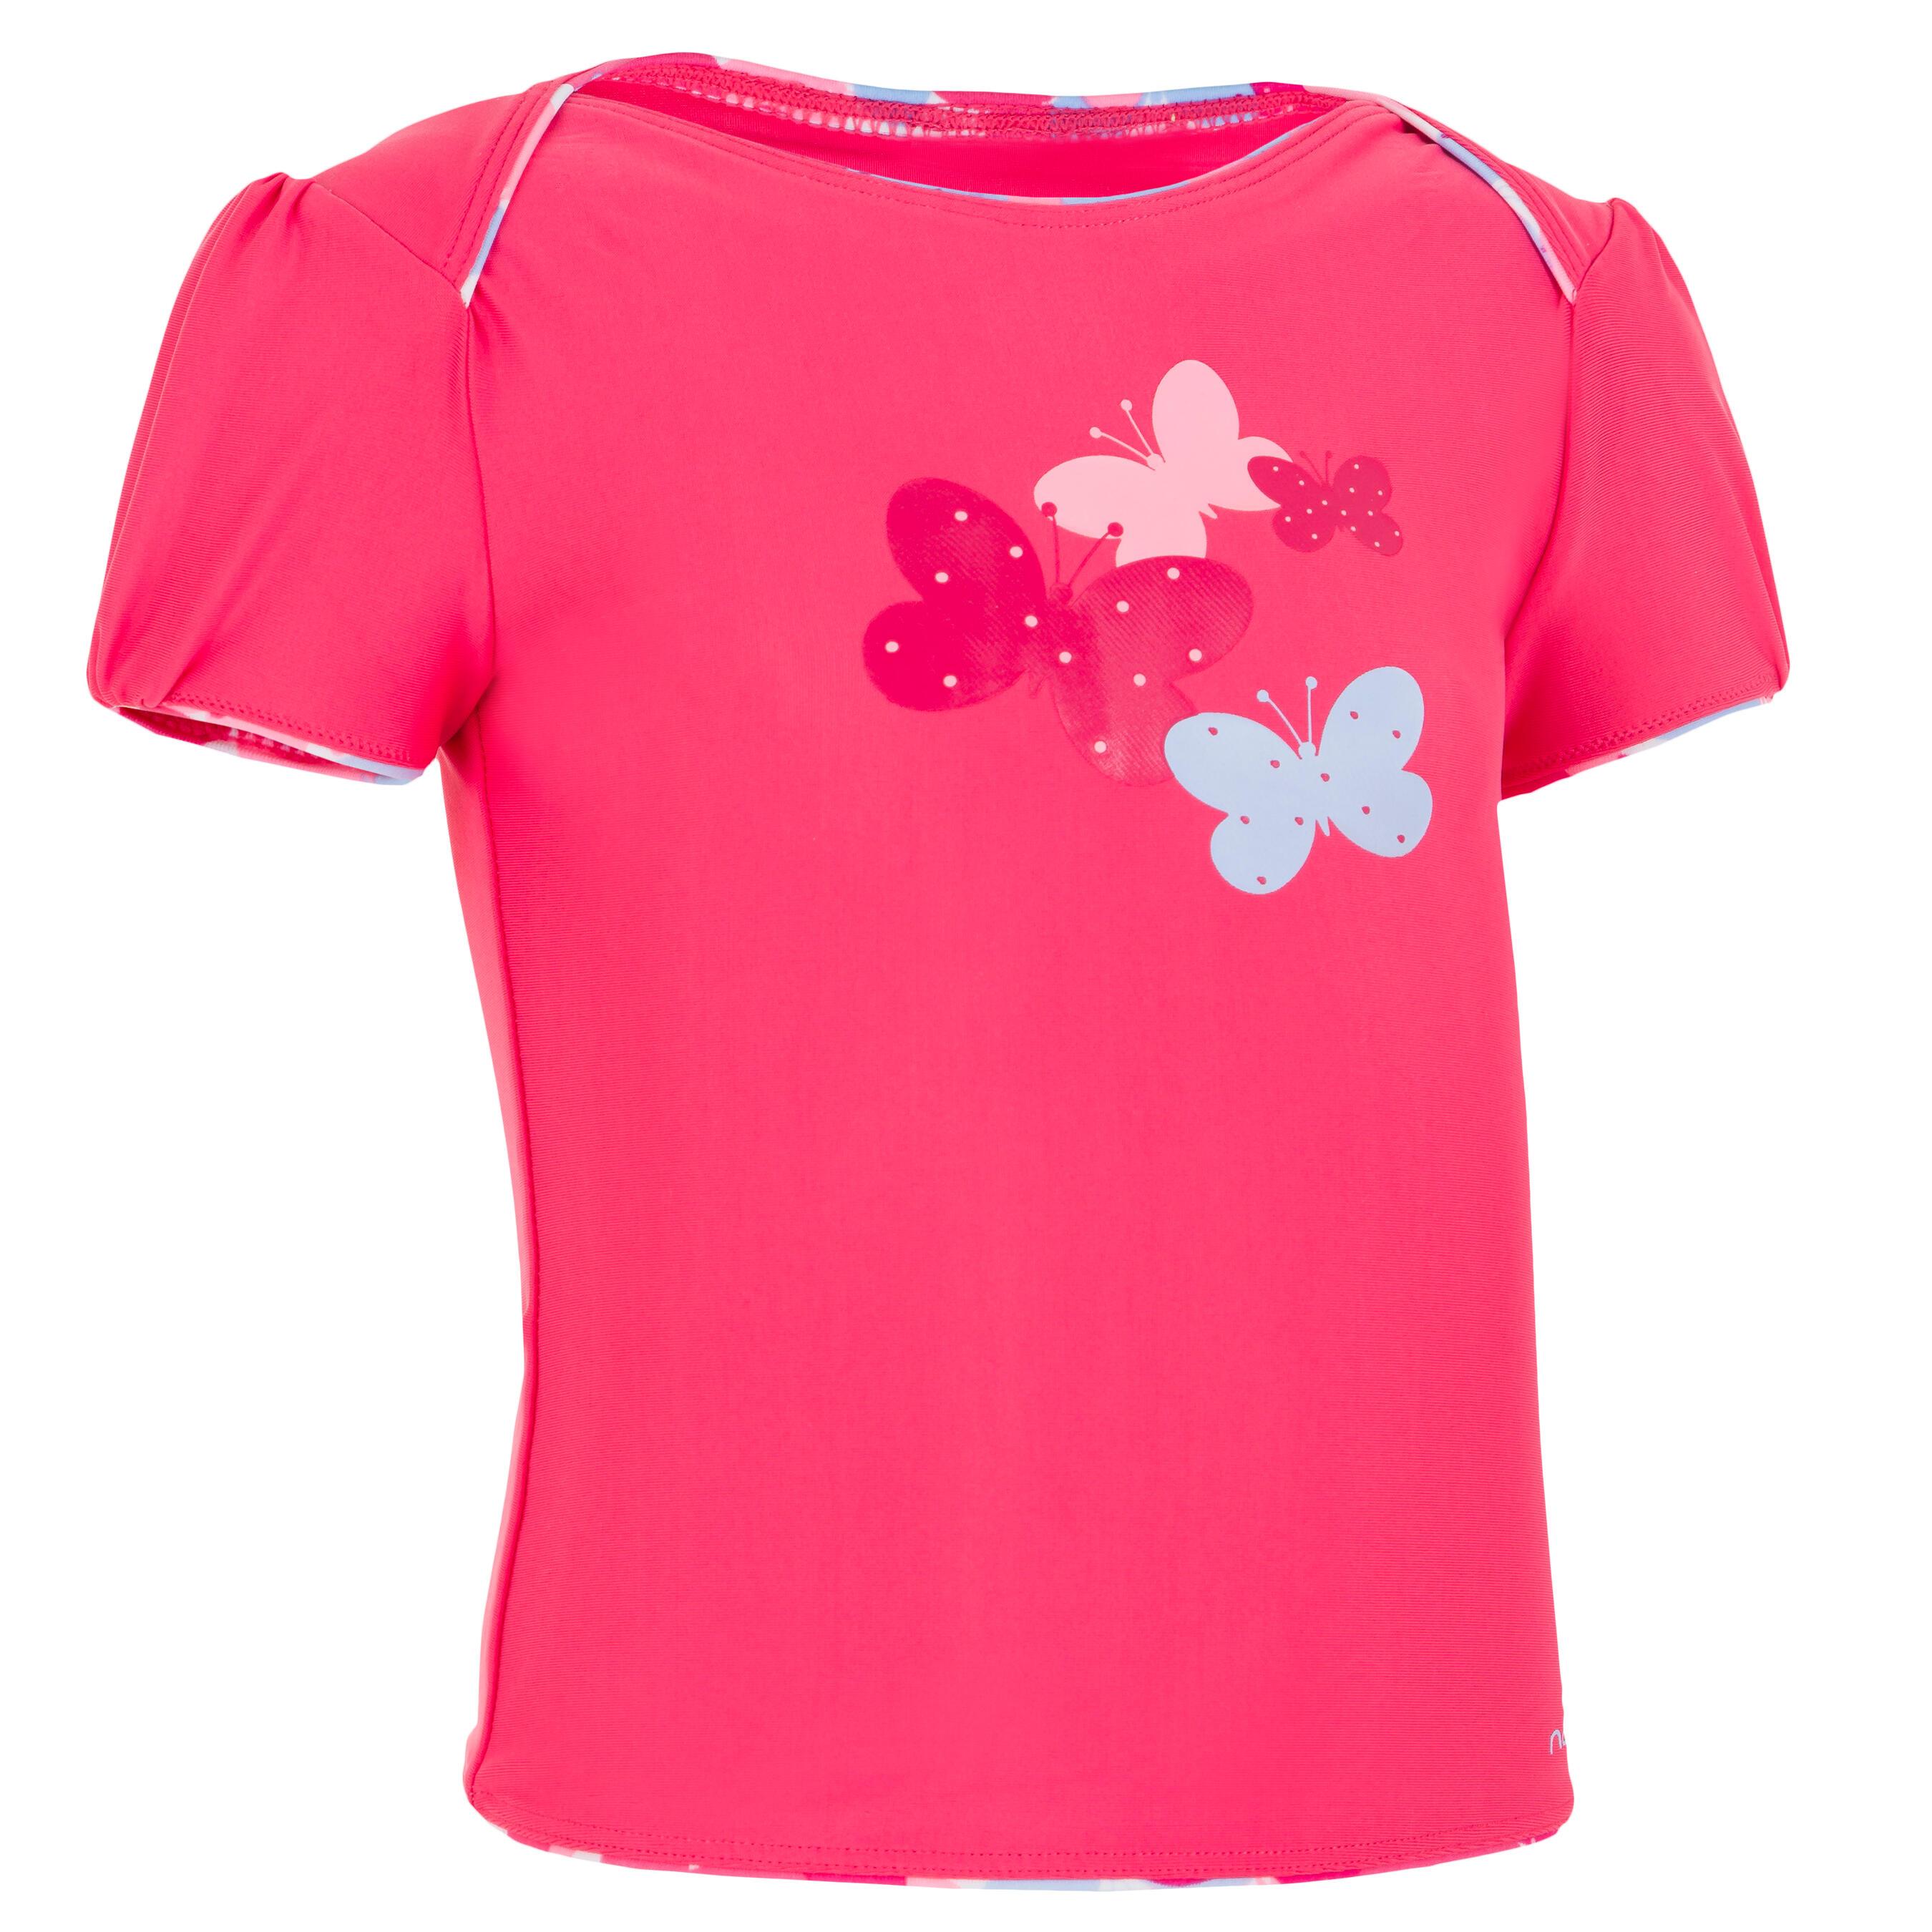 Maillot de bain bébé fille tankini haut, motif papillons, rose